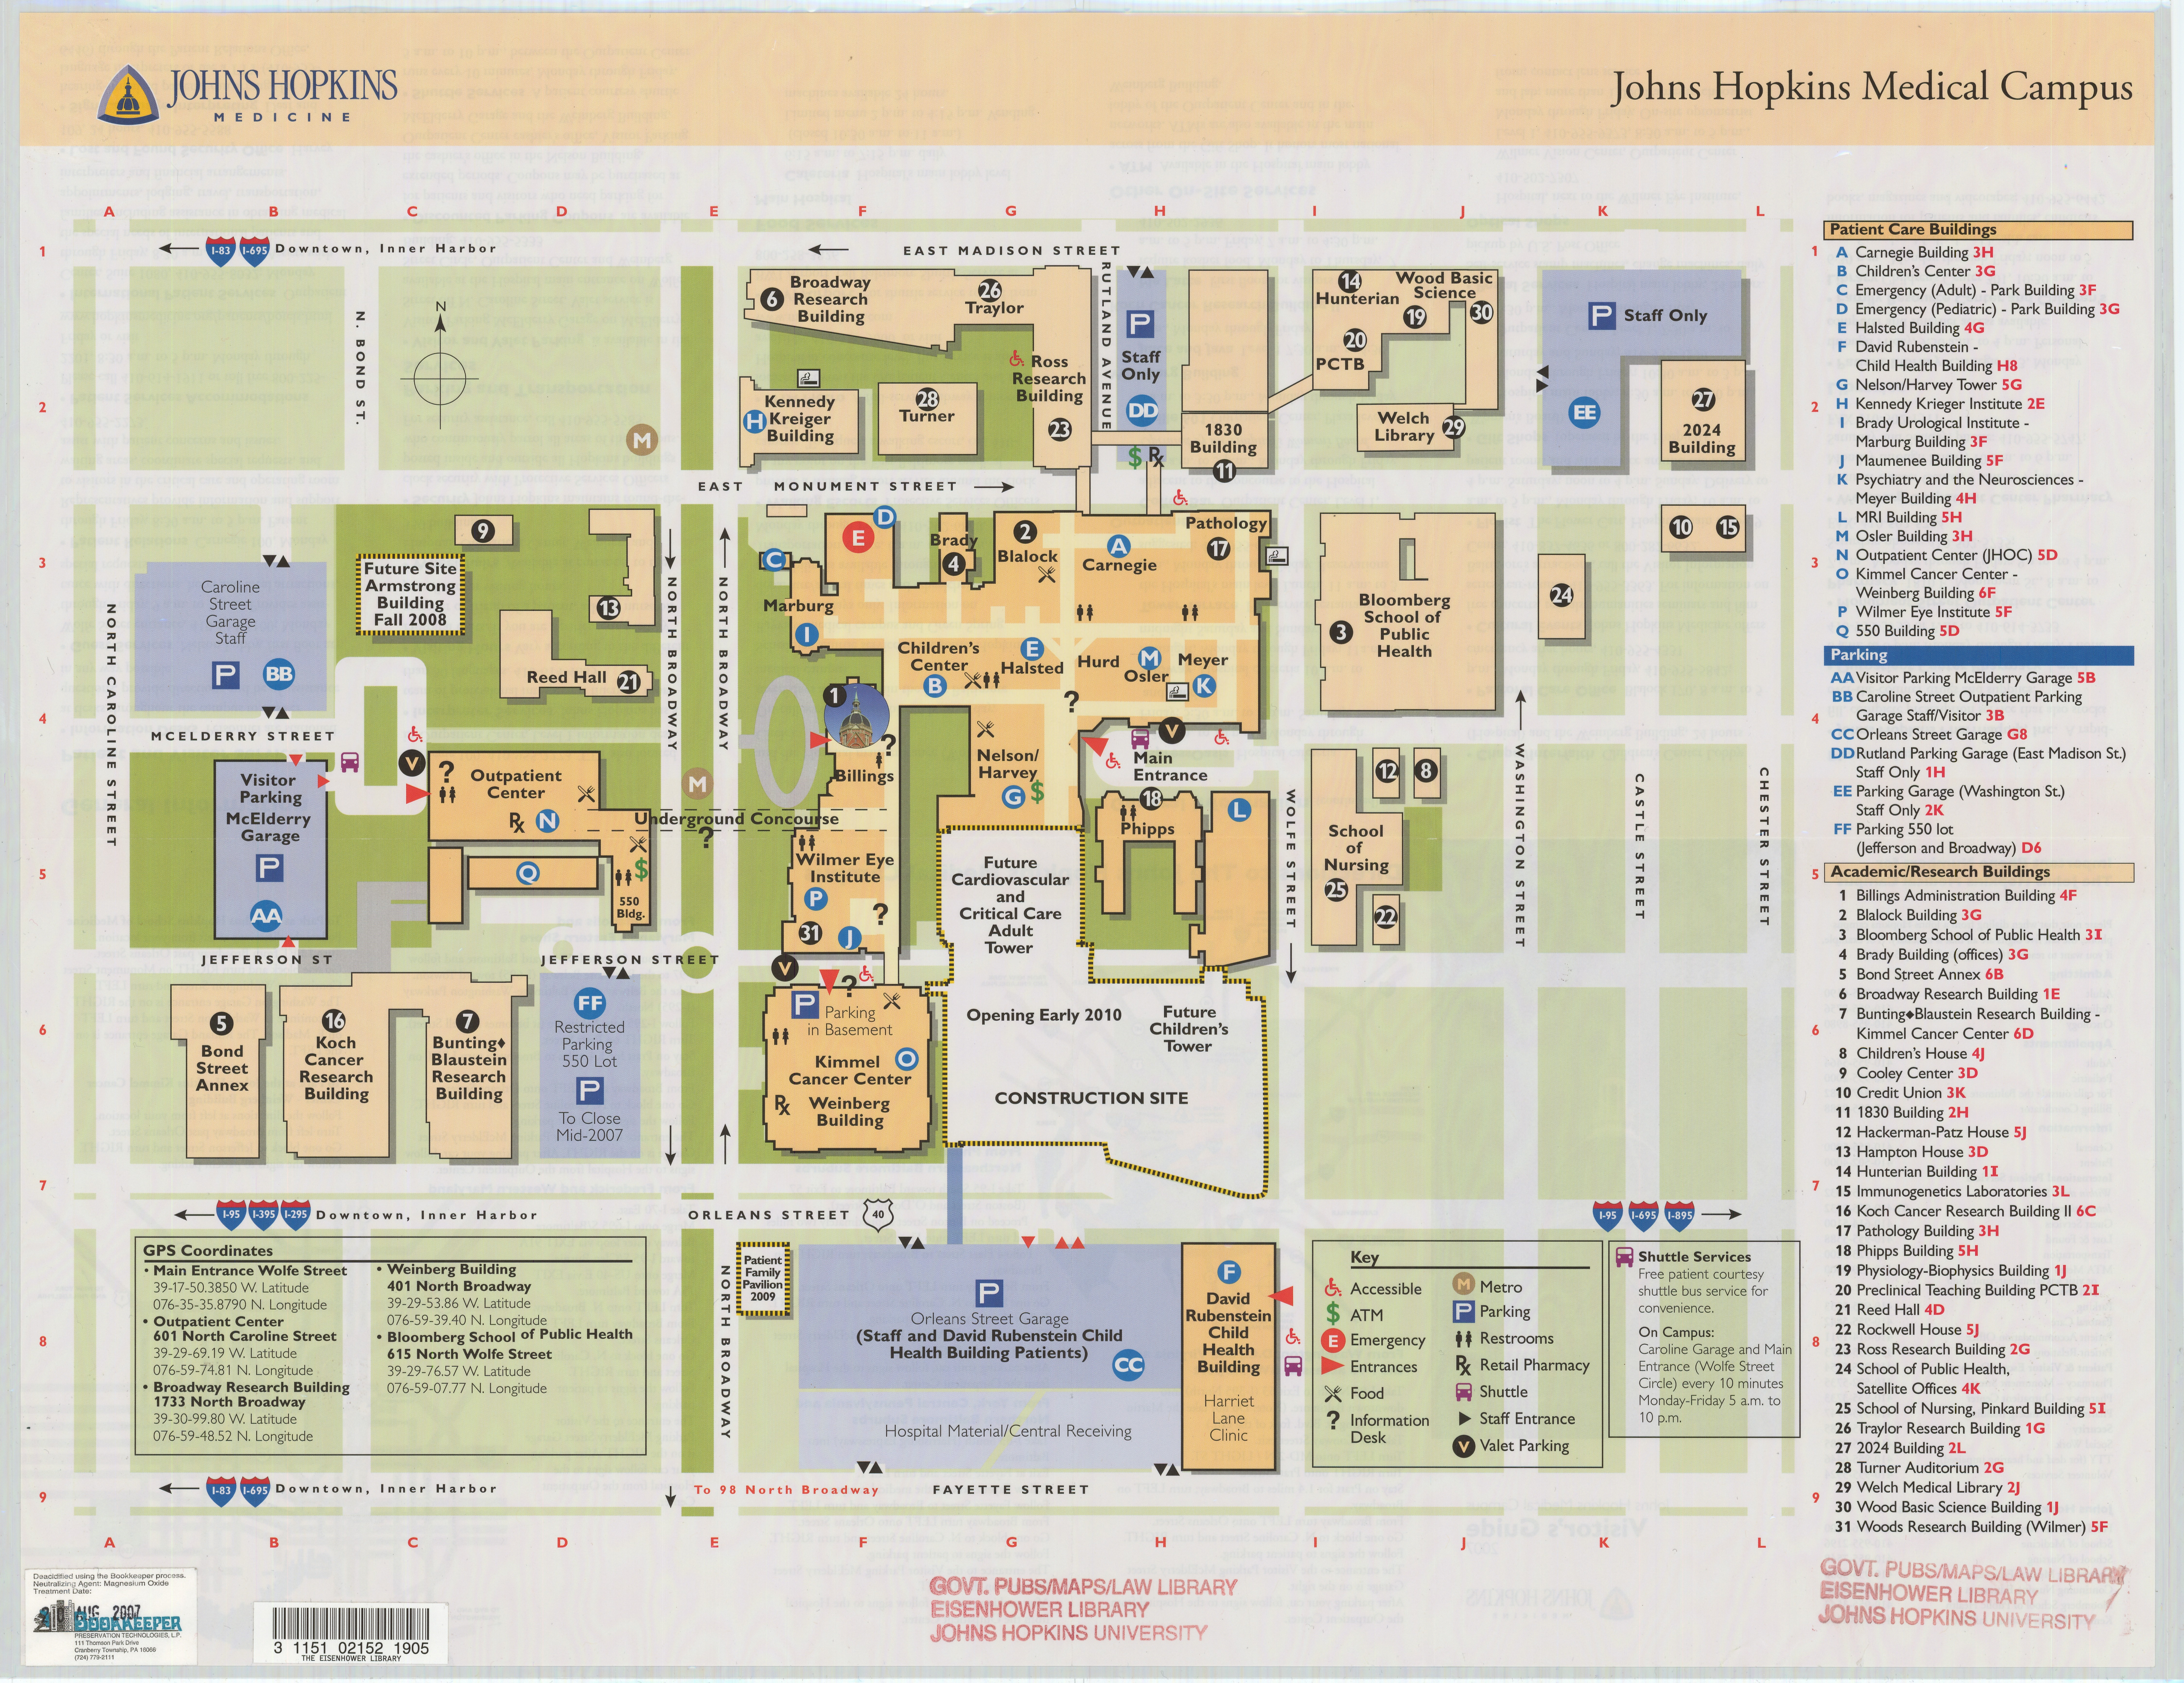 Hopkins Medical Campus Map.Johns Hopkins Medical Campus Visitor S Guide 2007